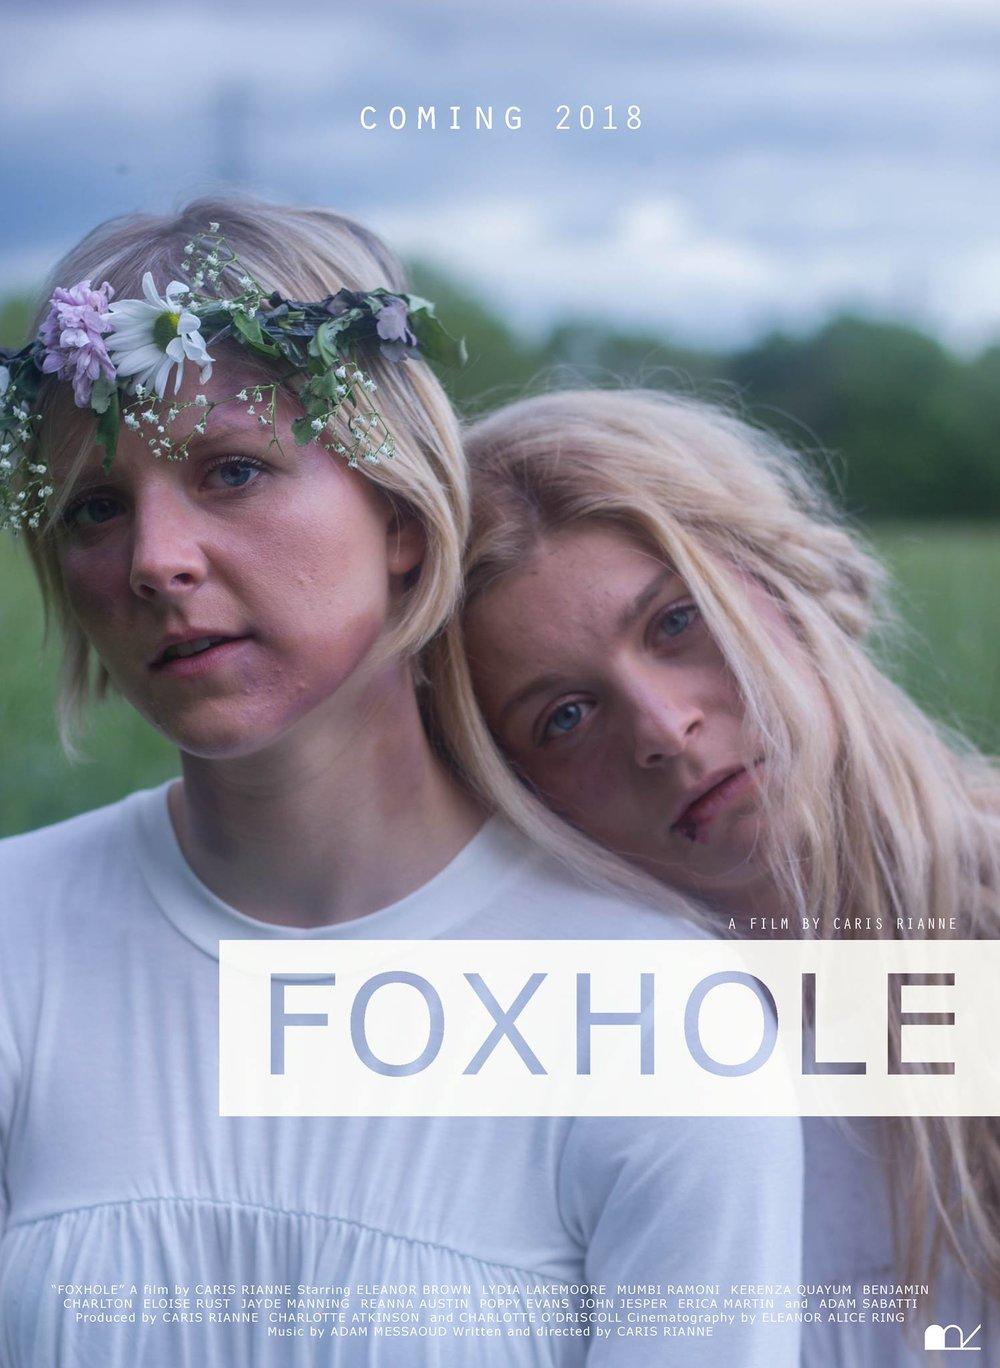 FOXHOLE MAIN POSTER.jpg